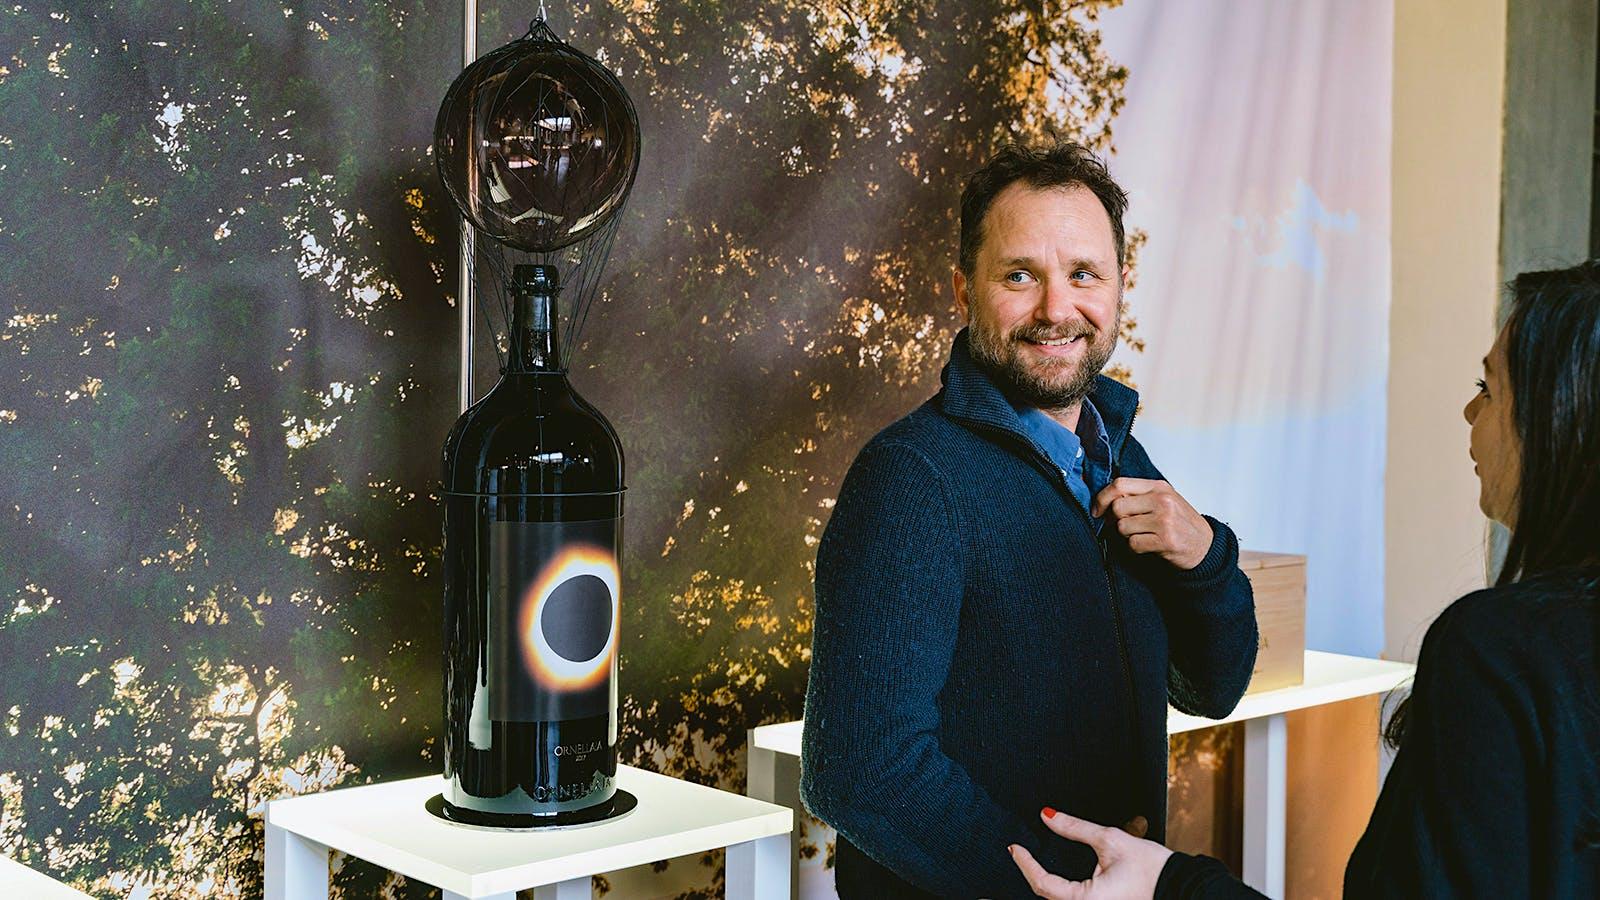 Tomás Saraceno Lights Up Ornellaia; Rosie Assoulin Designs Natural Wine